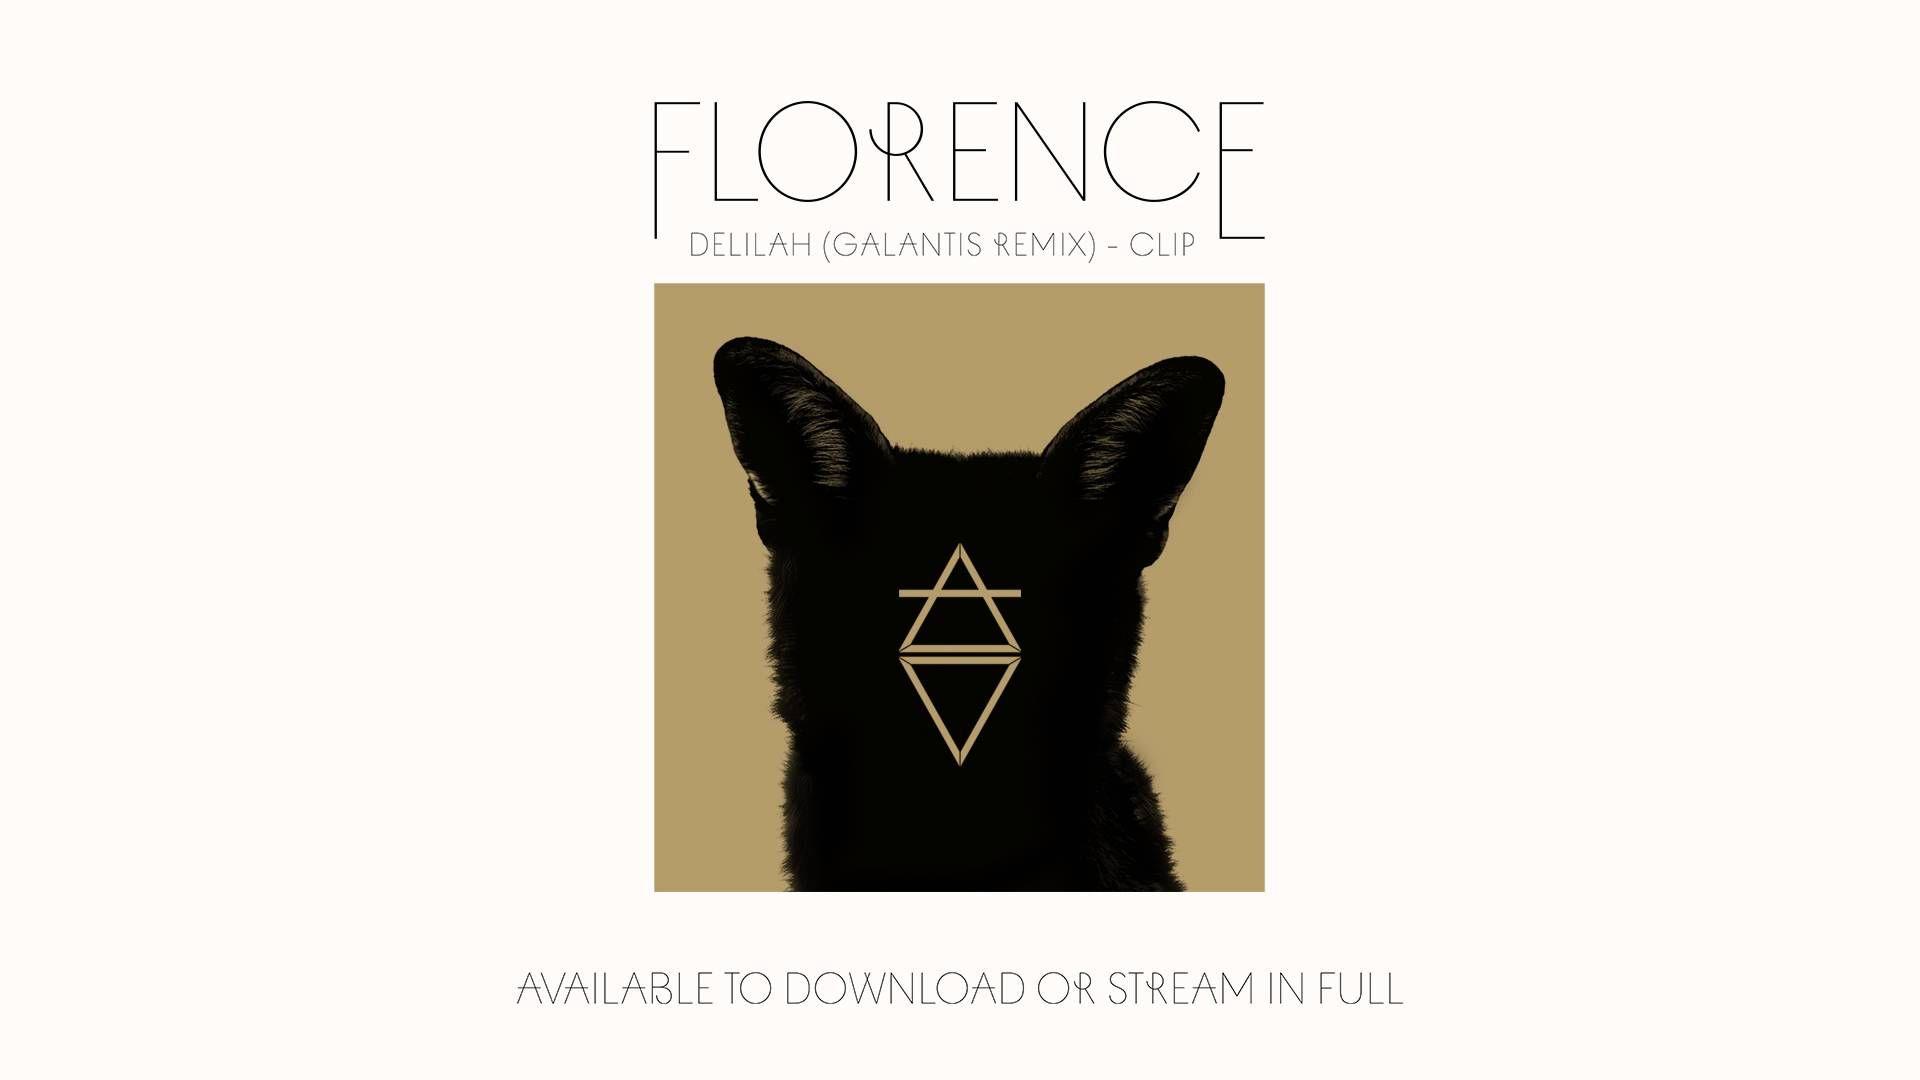 Florence + The Machine - Delilah (Galantis Remix)